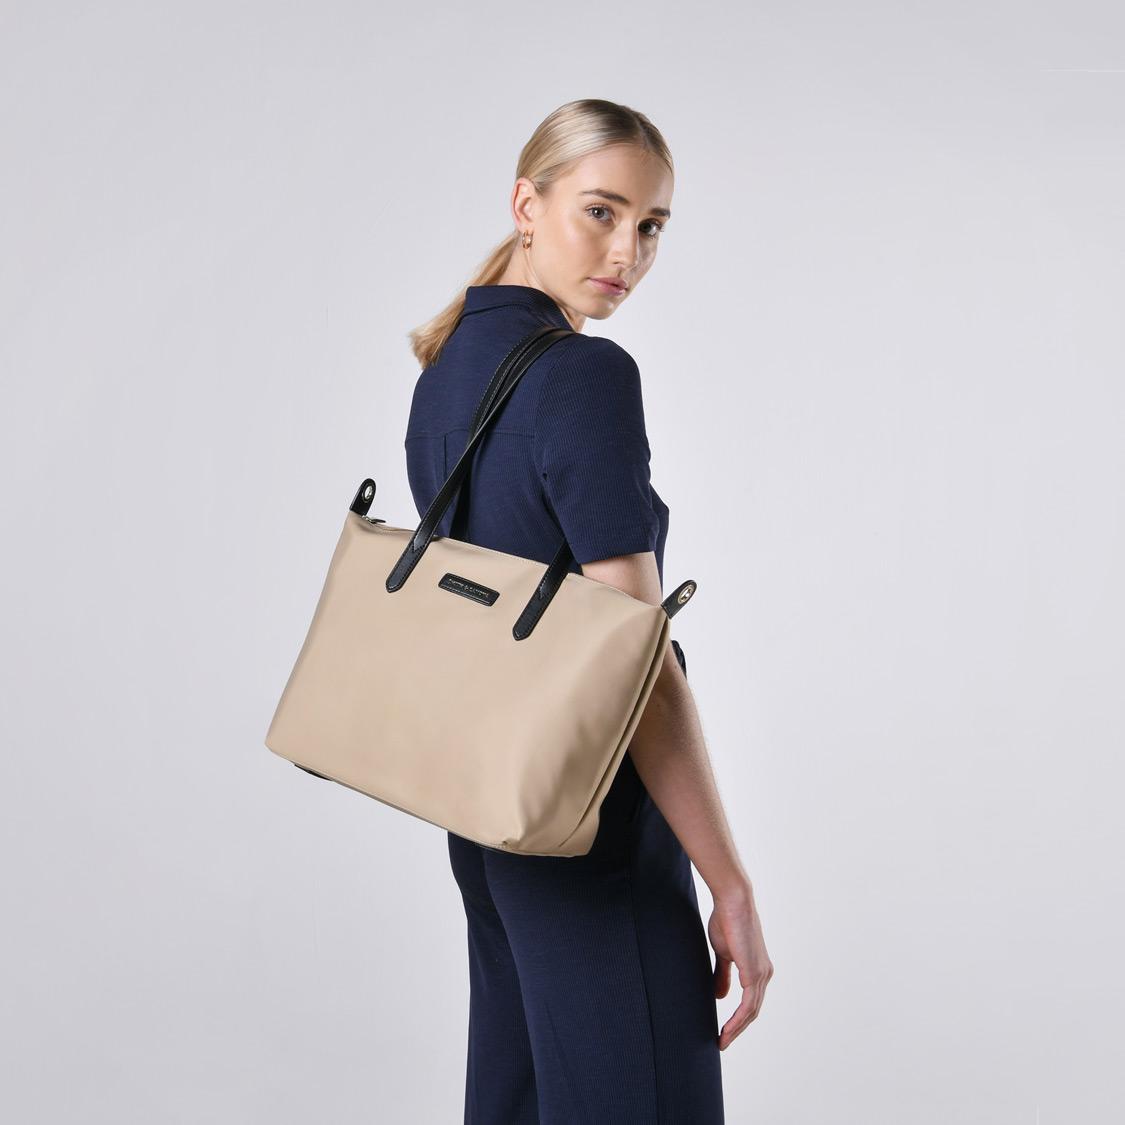 Smith & Canova - Nylon Capsule Collection